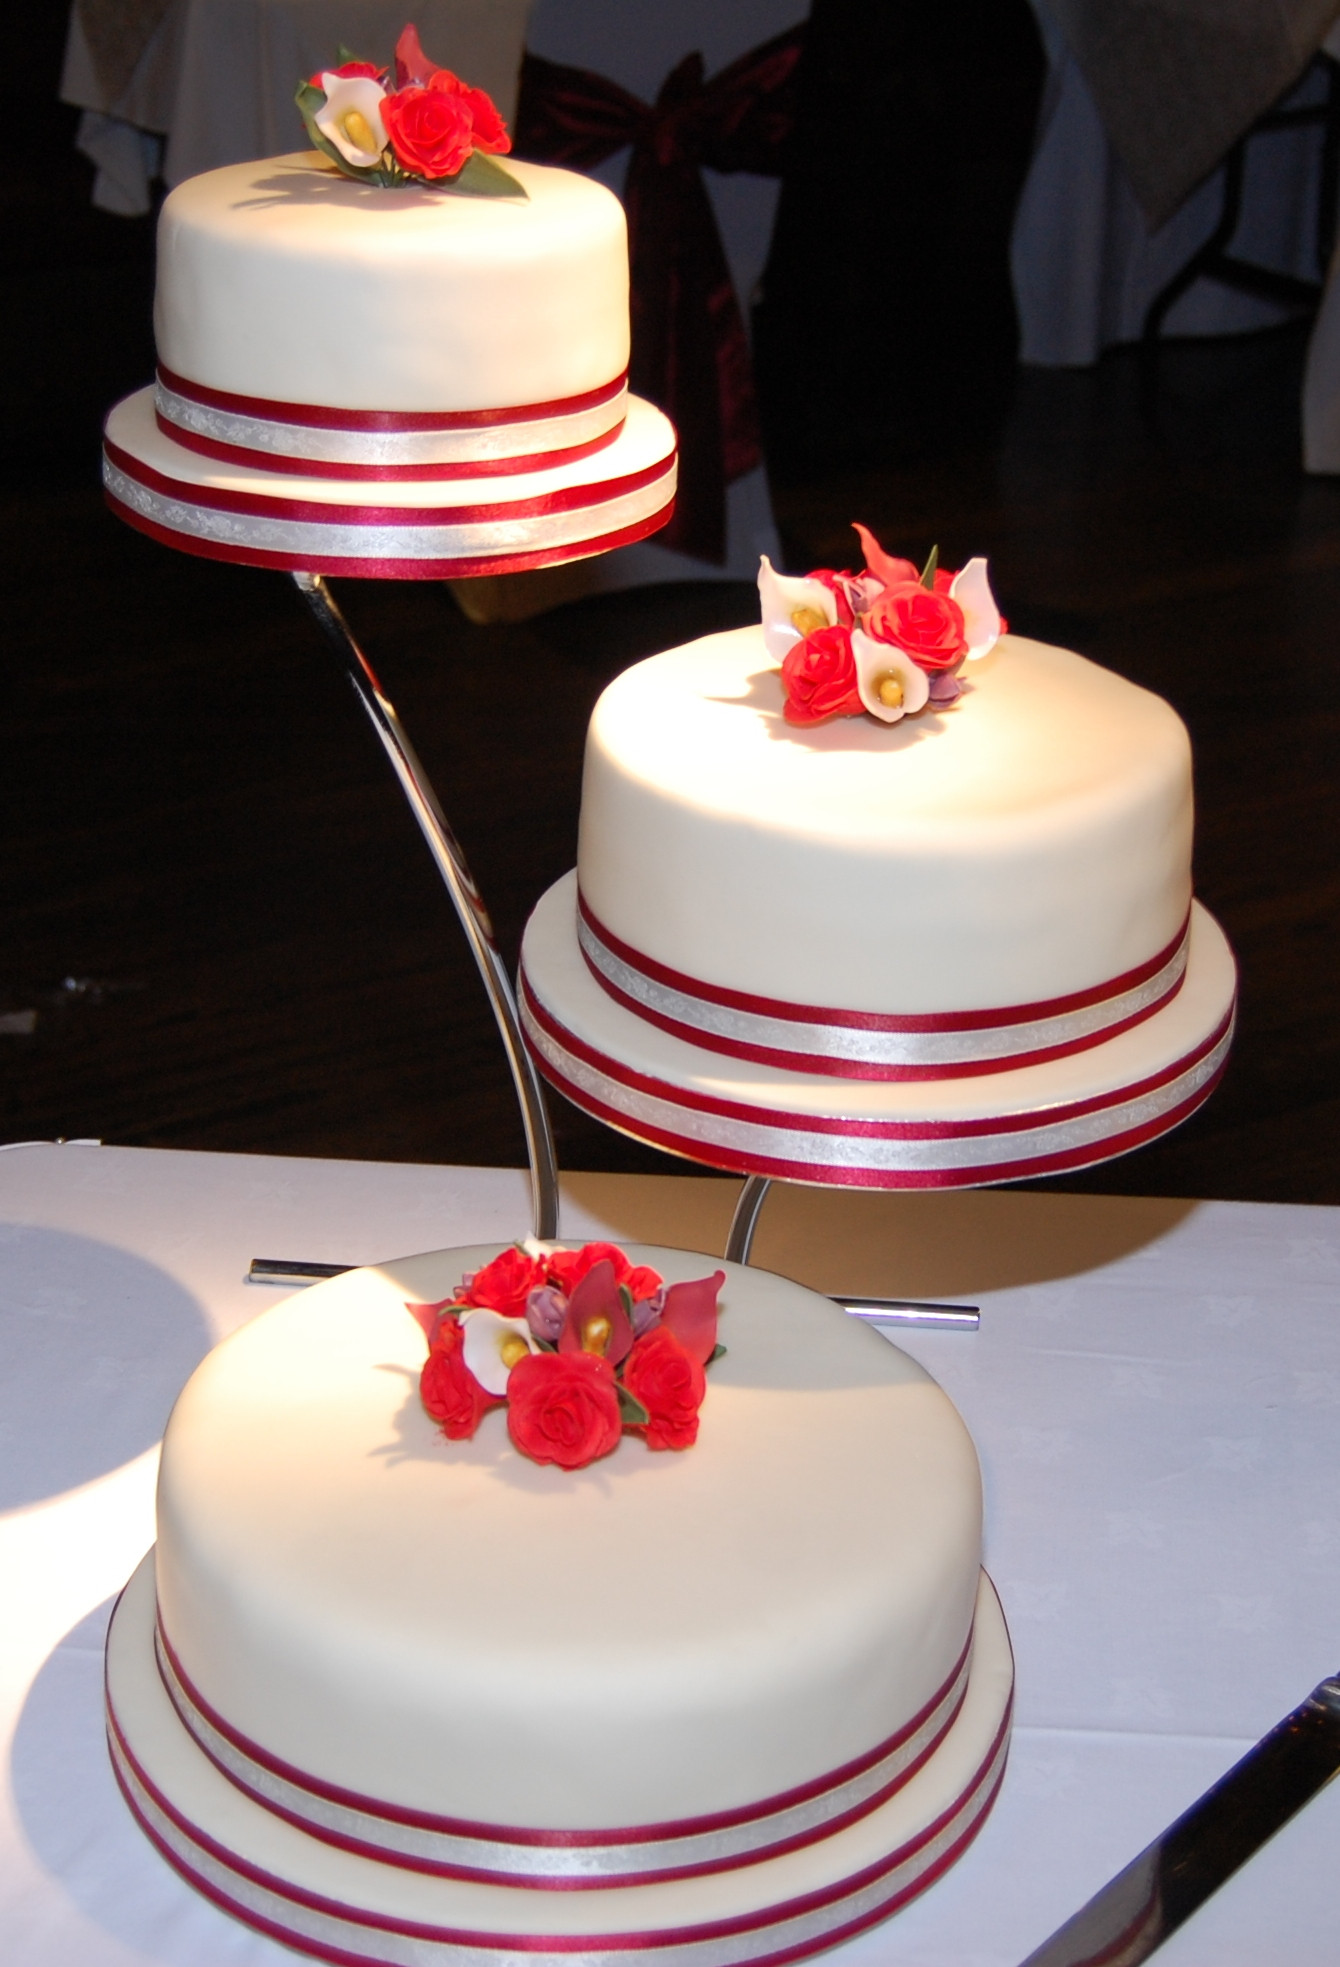 Tiered Wedding Cakes  Wedding cakes